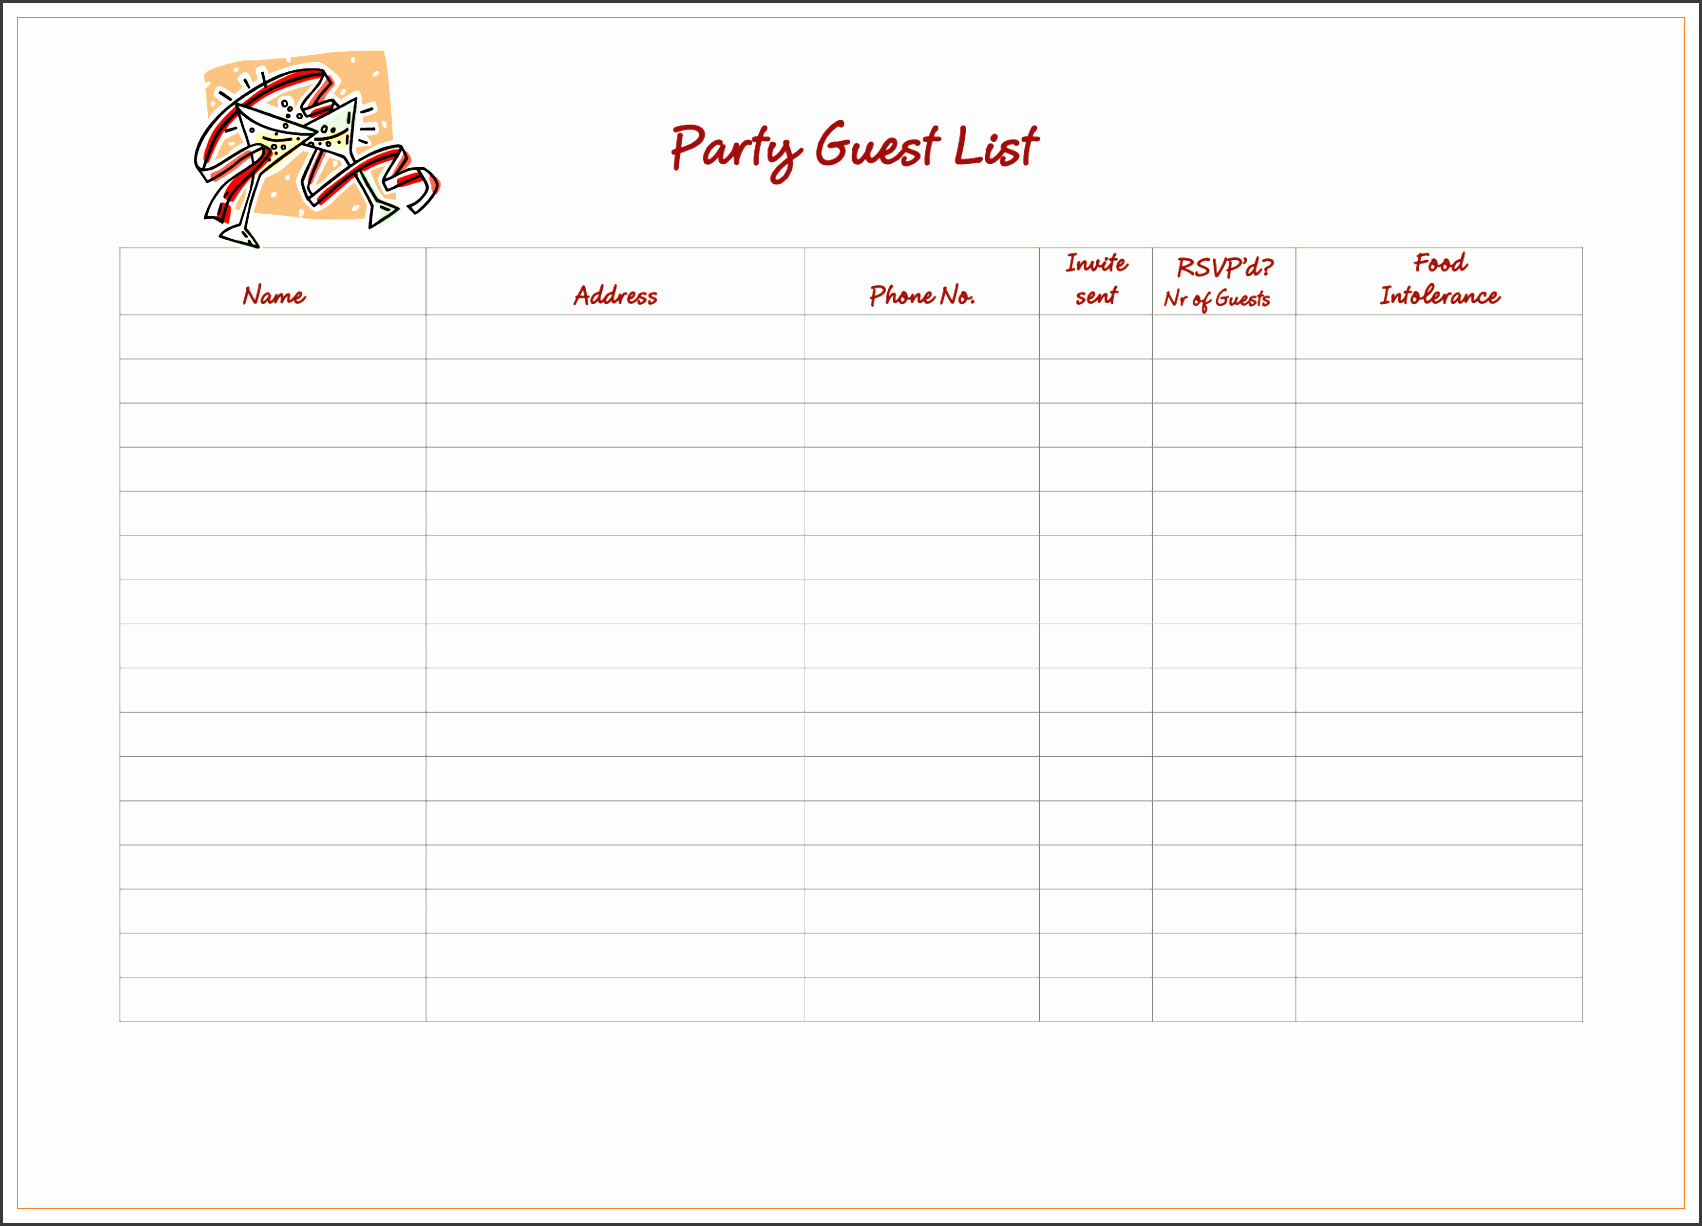 birthday party guest list doc 5 party guest list template bizdoska template